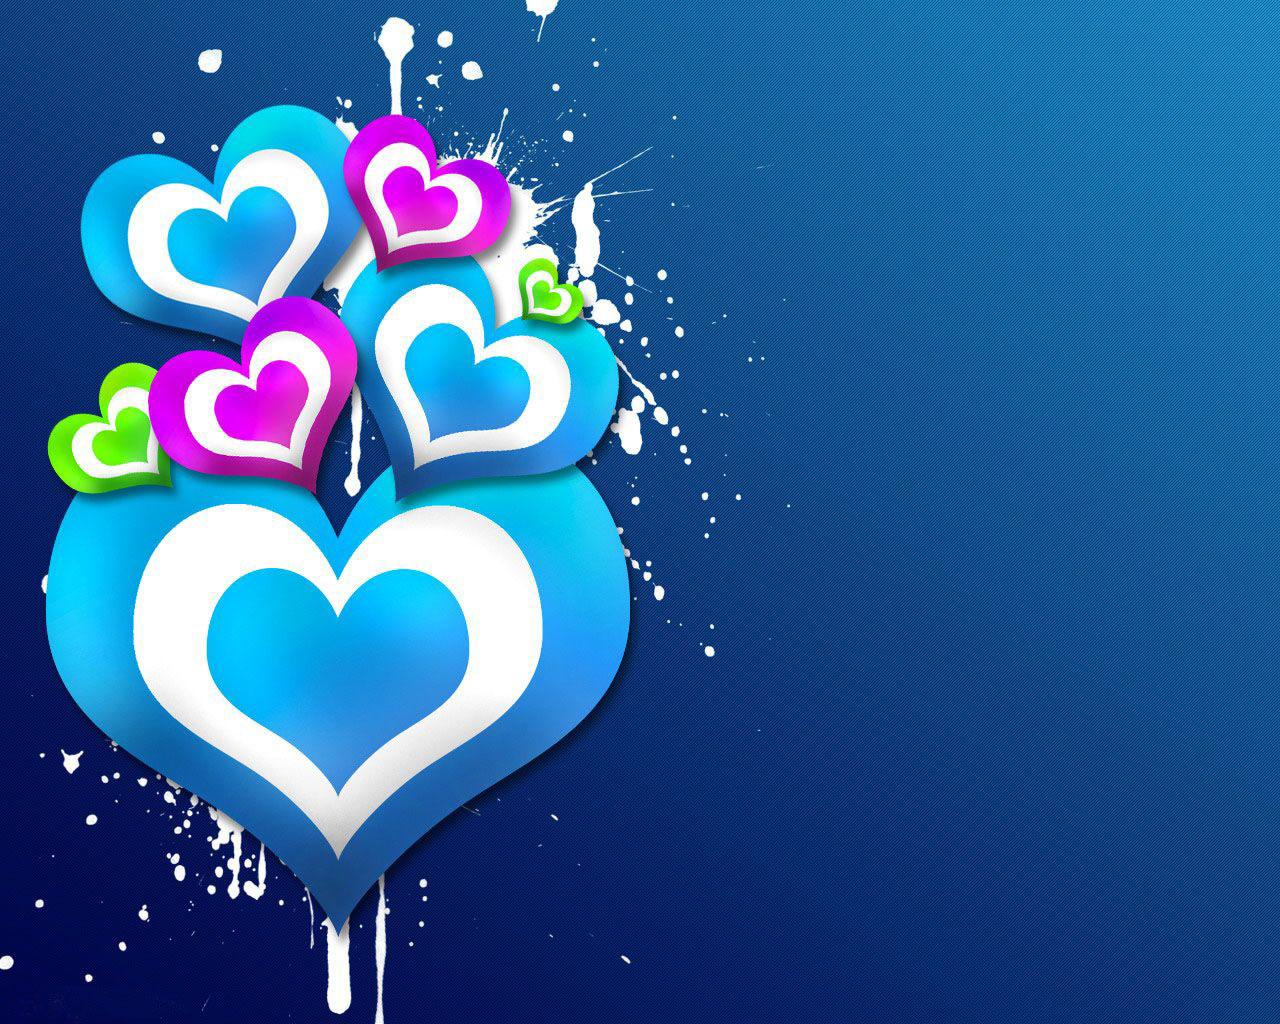 3D Love Wallpapers Download 8 Cool Hd Wallpaper 1280x1024